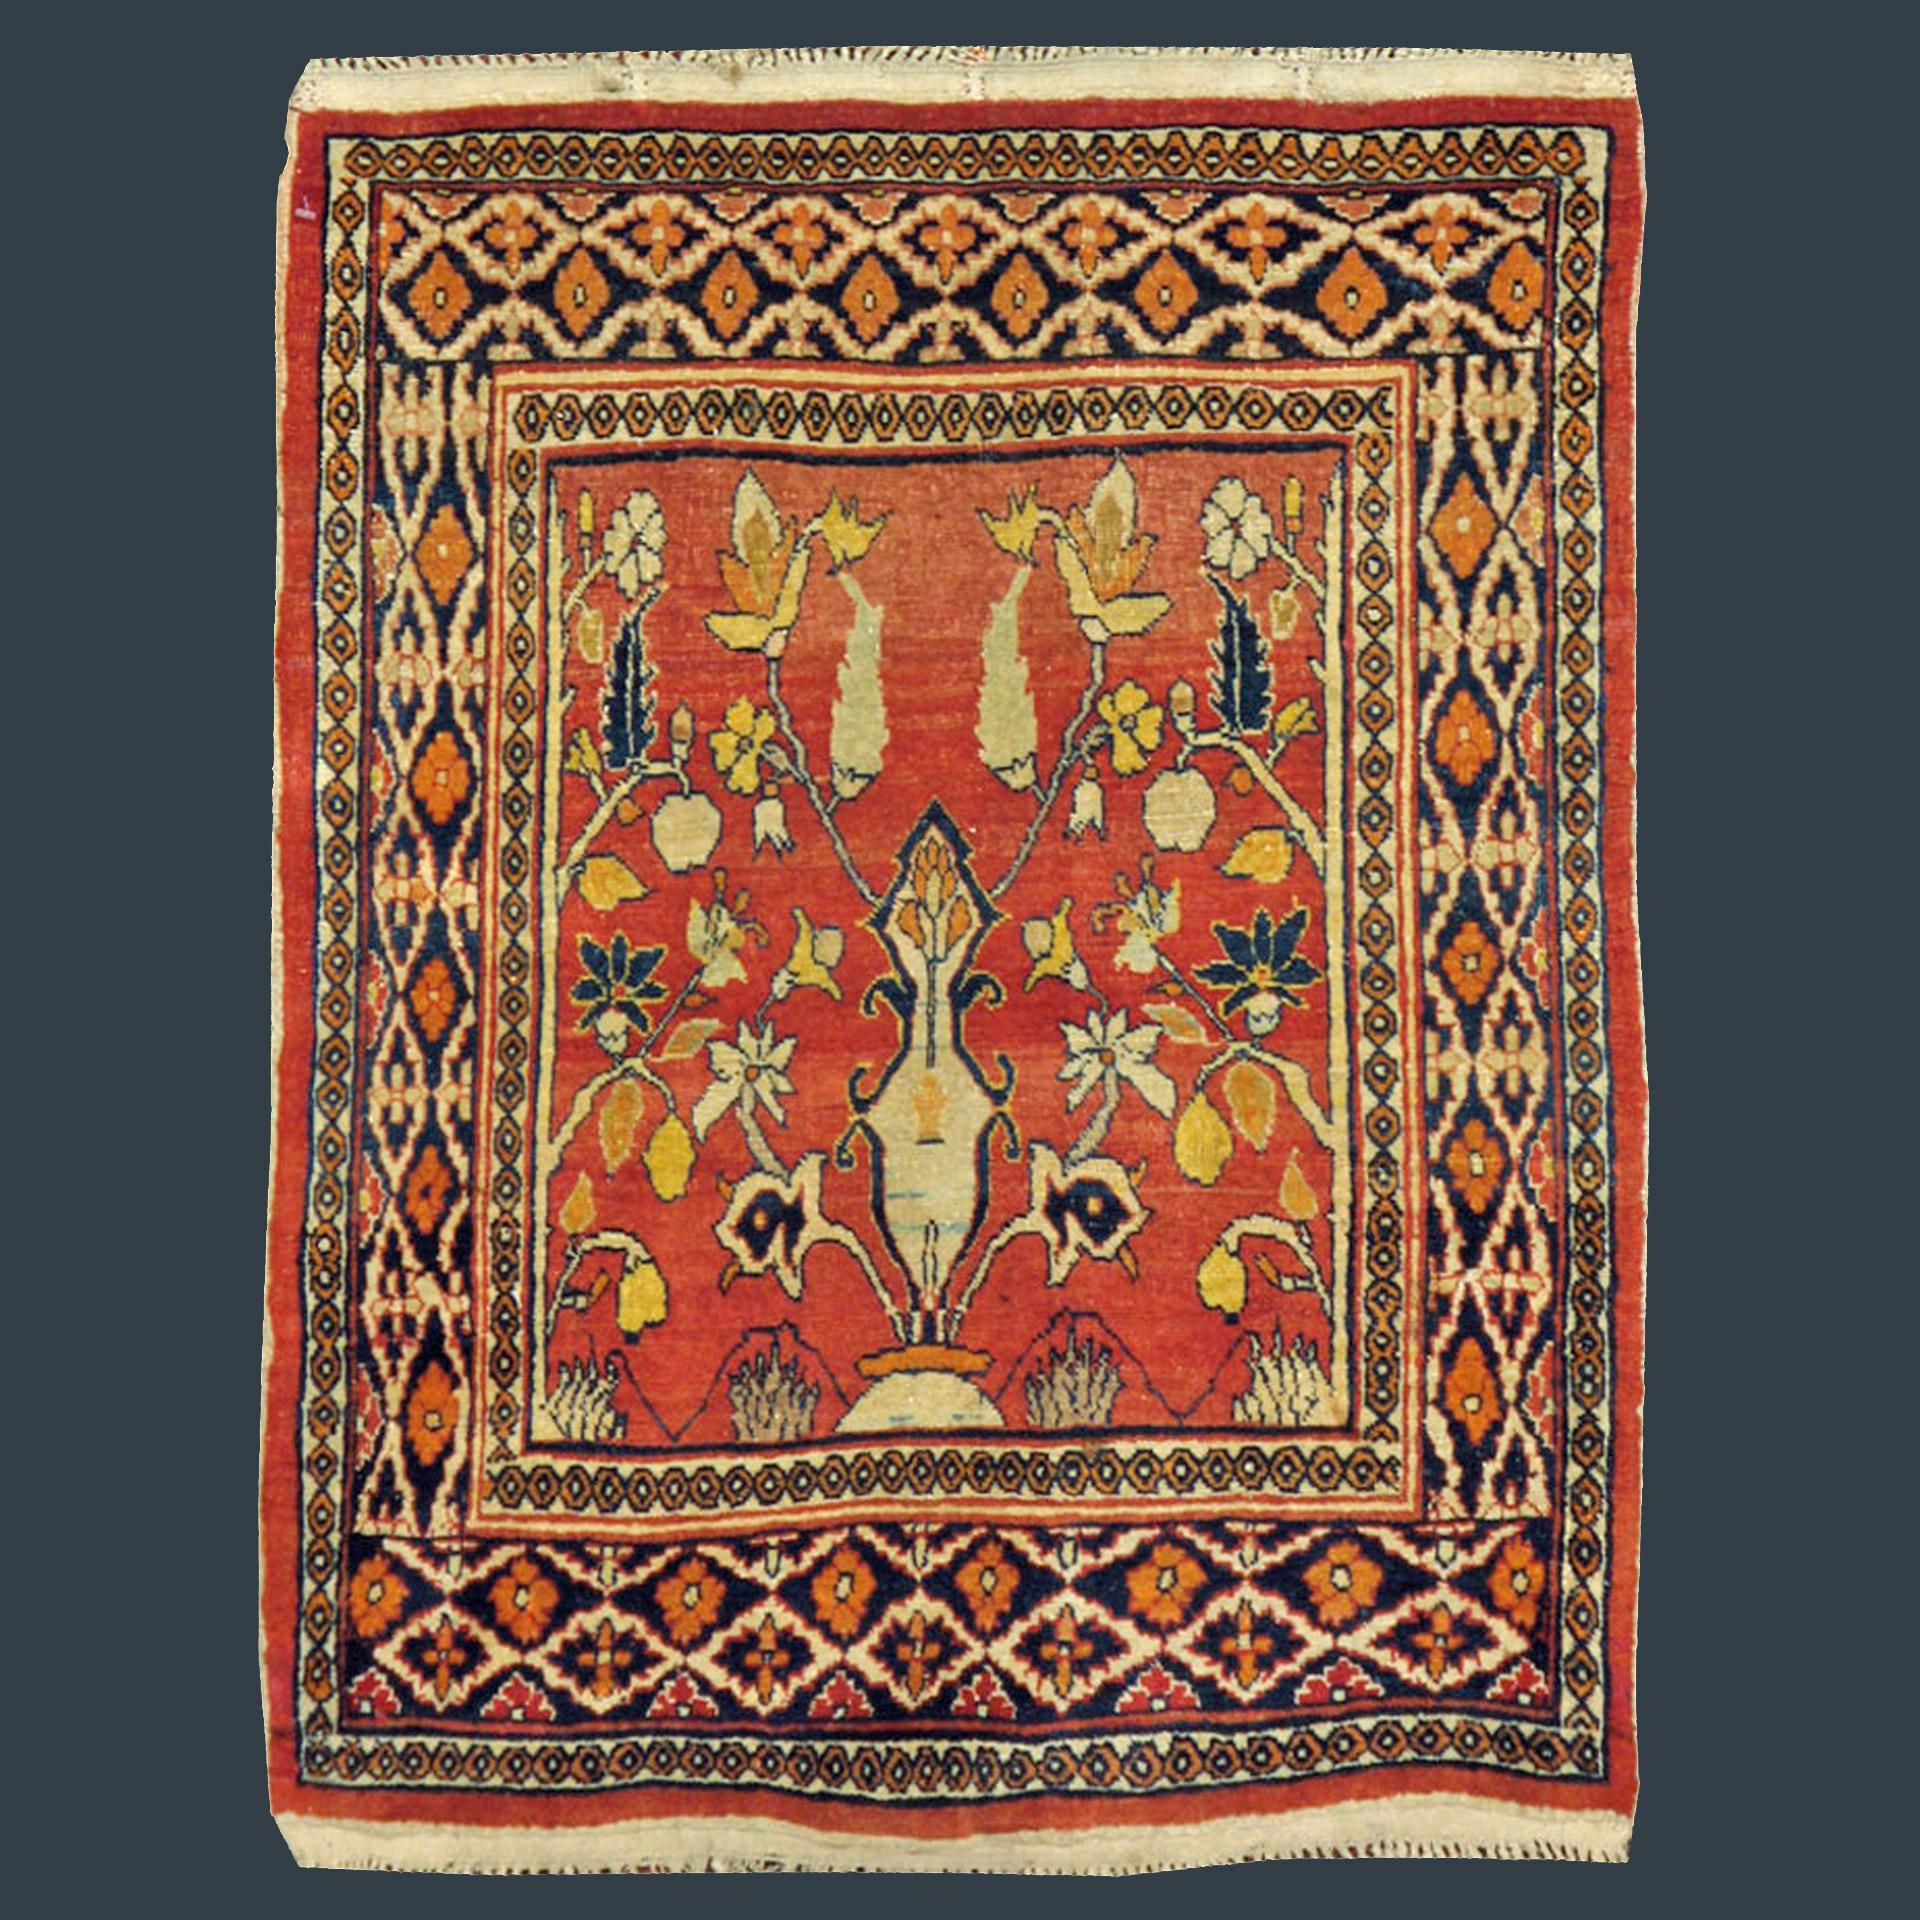 Antique Persian Tabriz Mat or Poshti - small rug